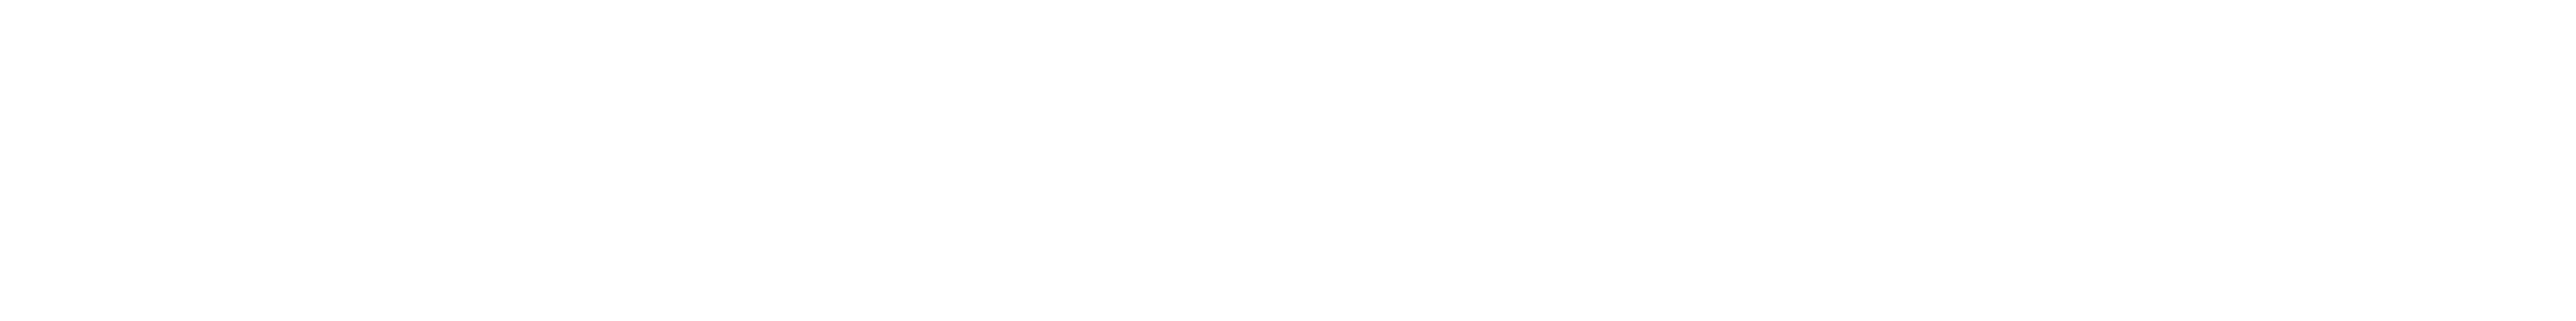 Luxemburger Wort image